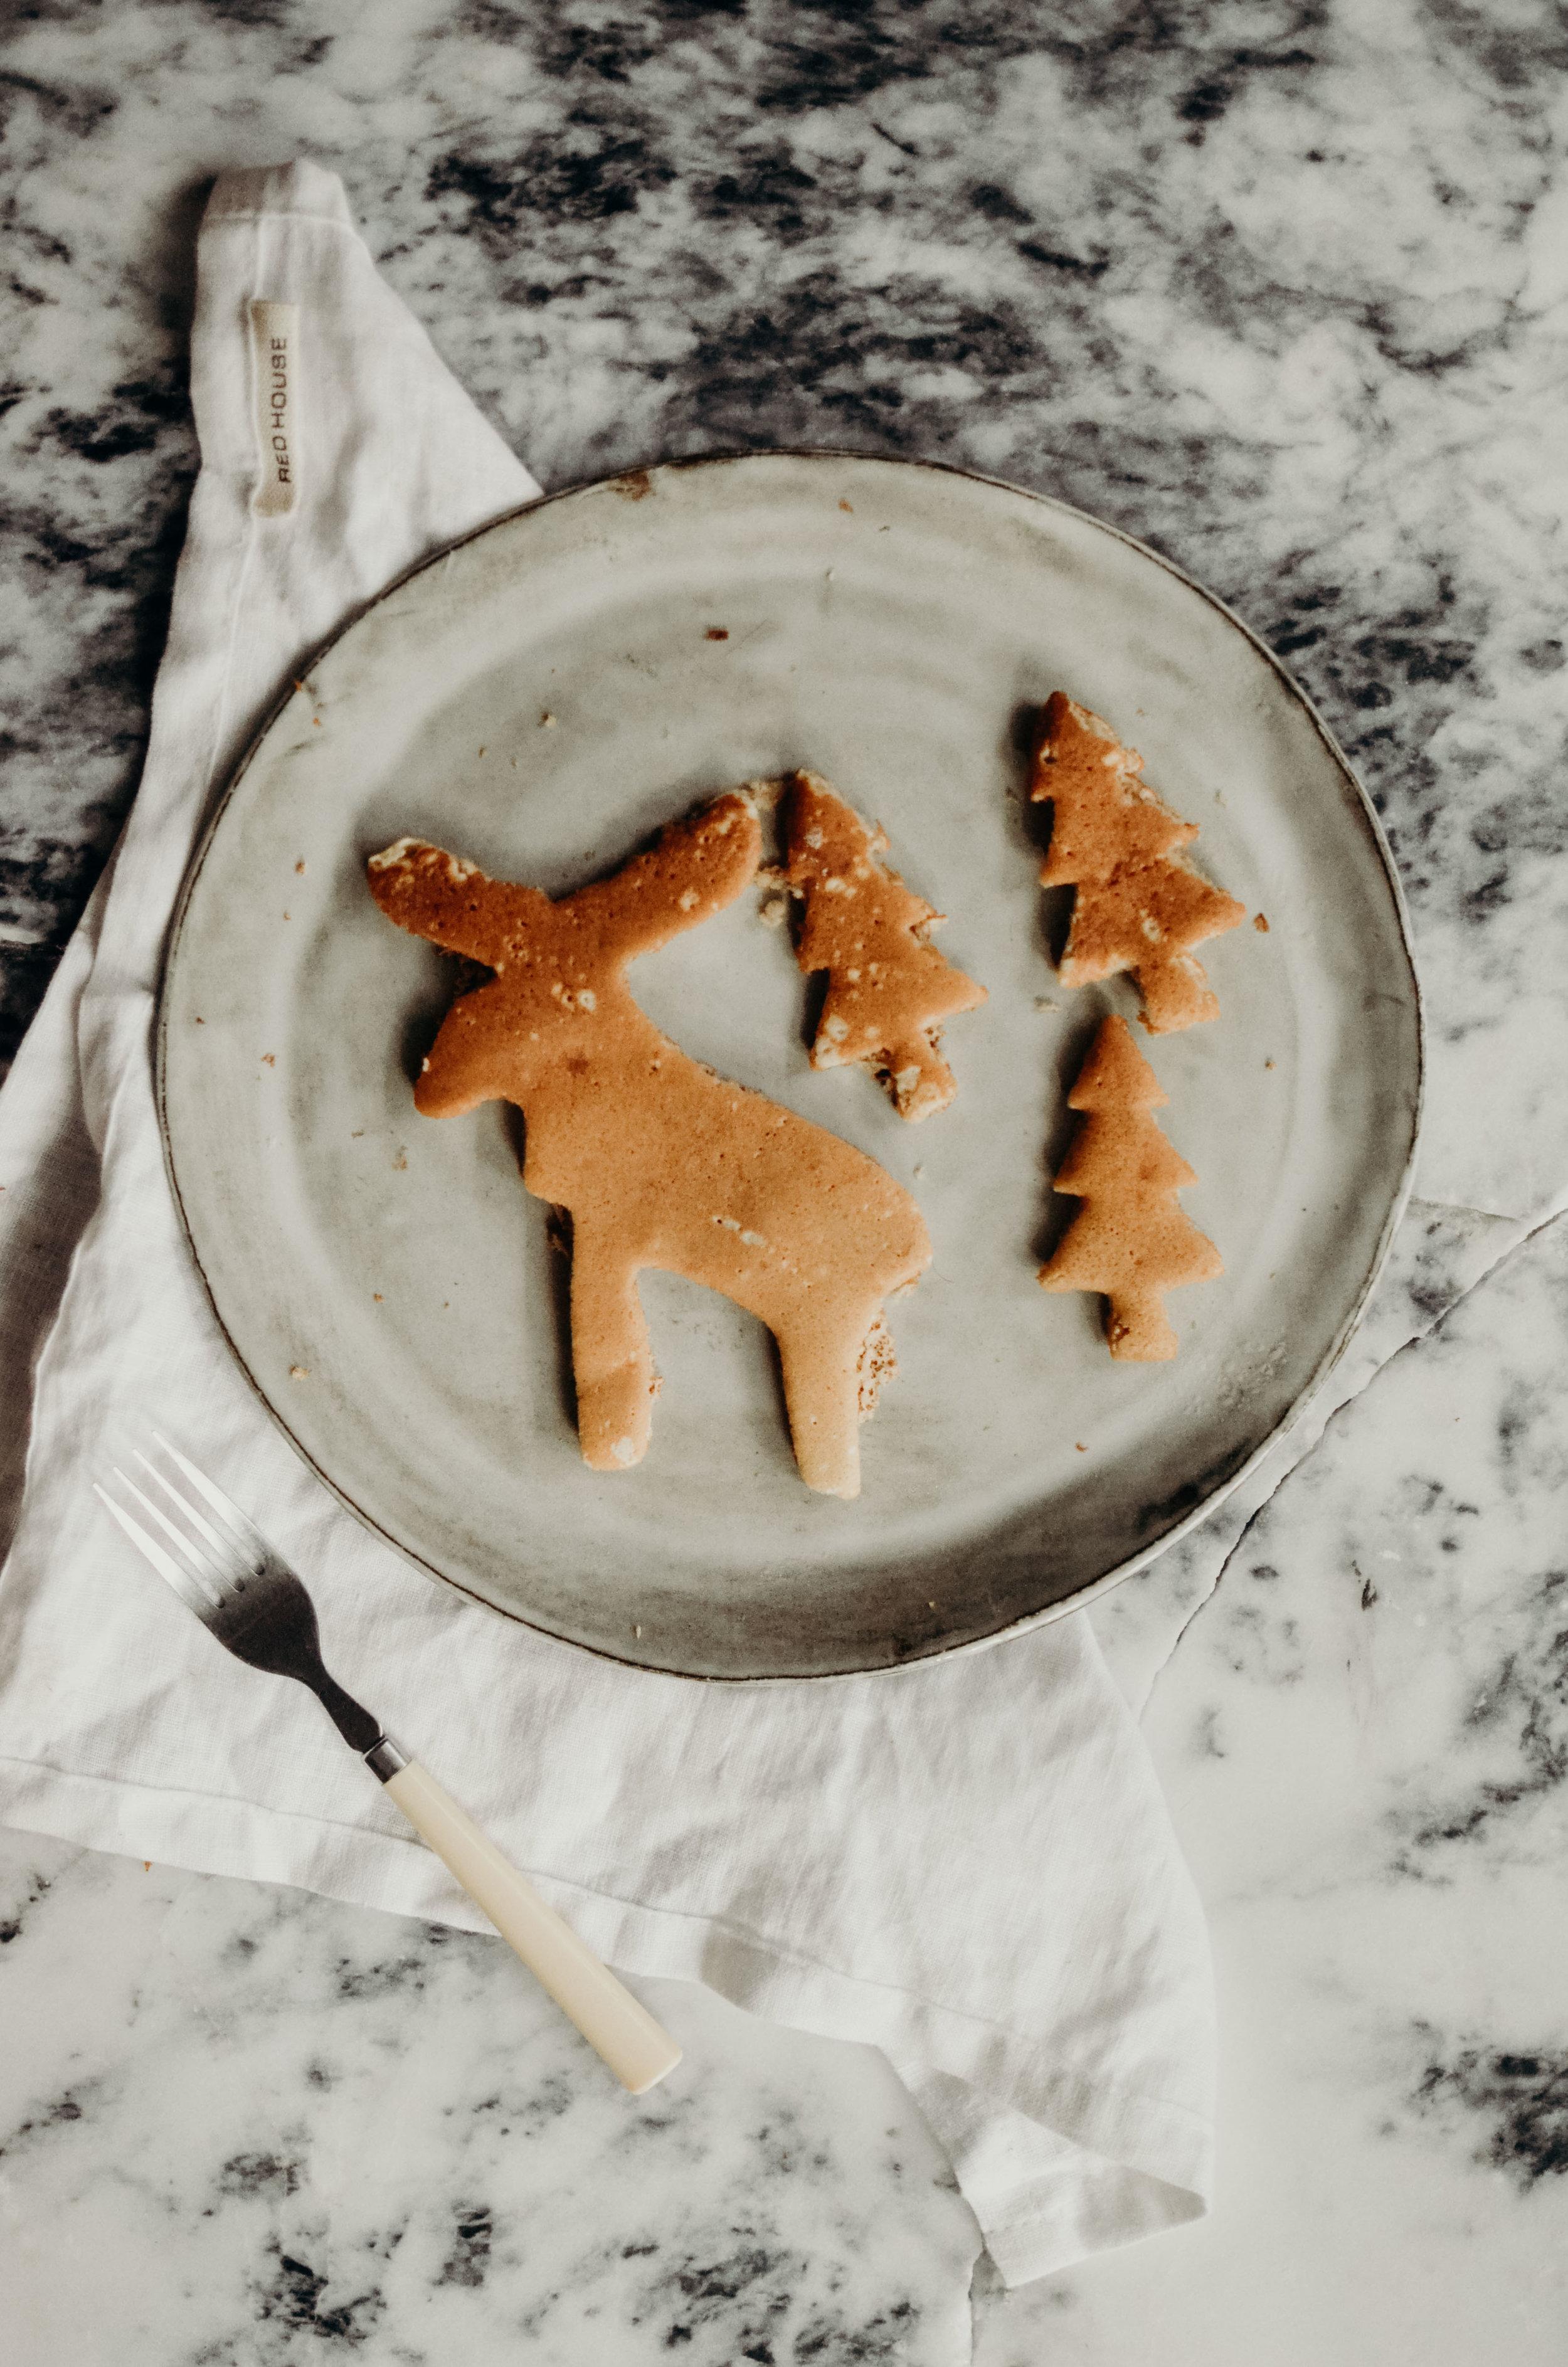 Wendling_Boyd_Moose_Shaped_Buffalo_Butter_Pancakes_Recipe-11.jpg